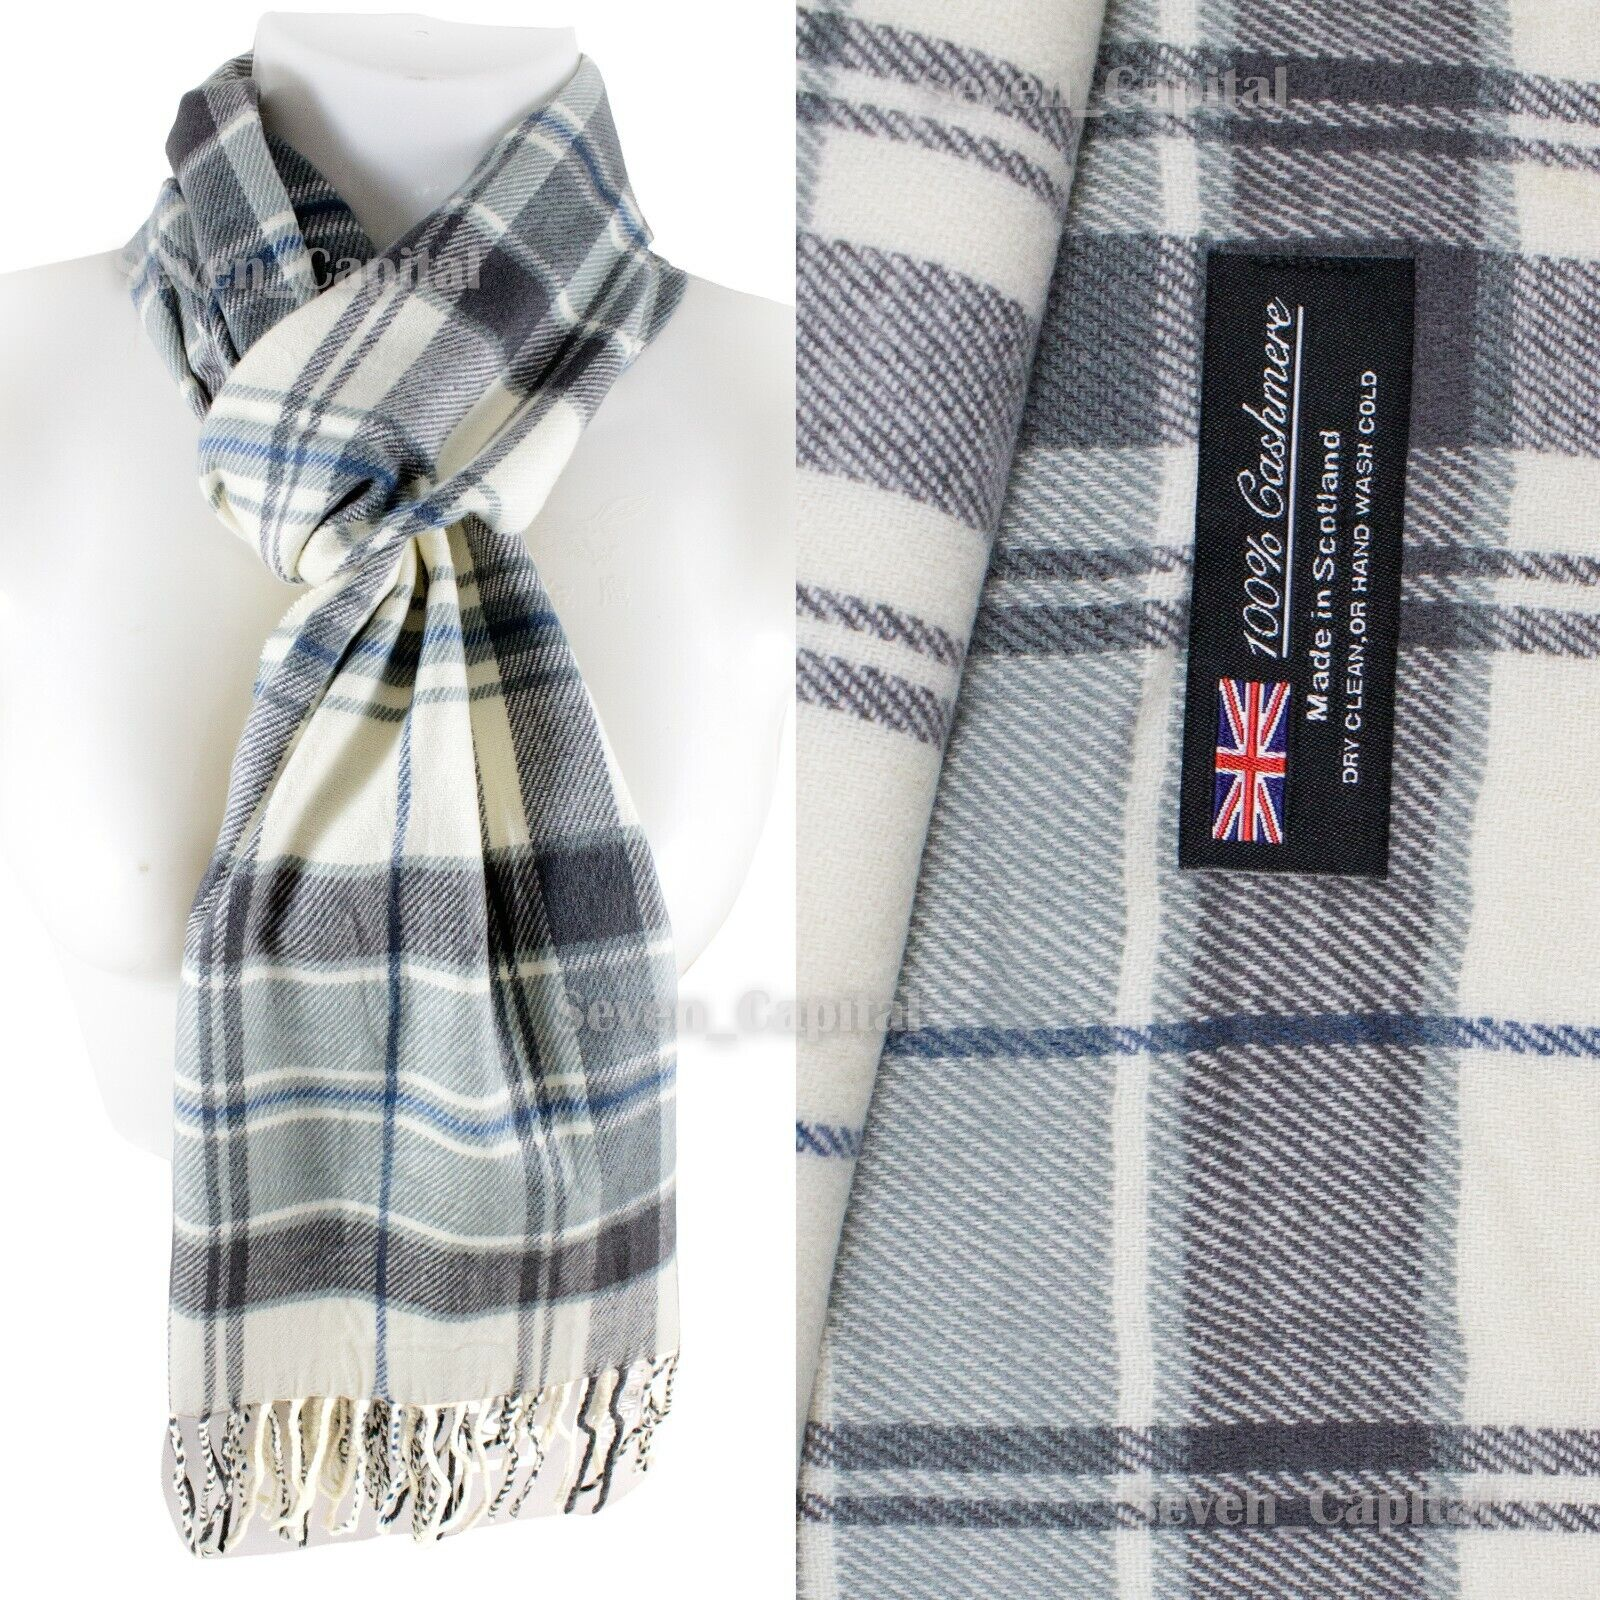 Mens Womens Winter Warm SCOTLAND Made 100% CASHMERE Scarf Scarves Plaid Wool 33. Plaid: Grey/White